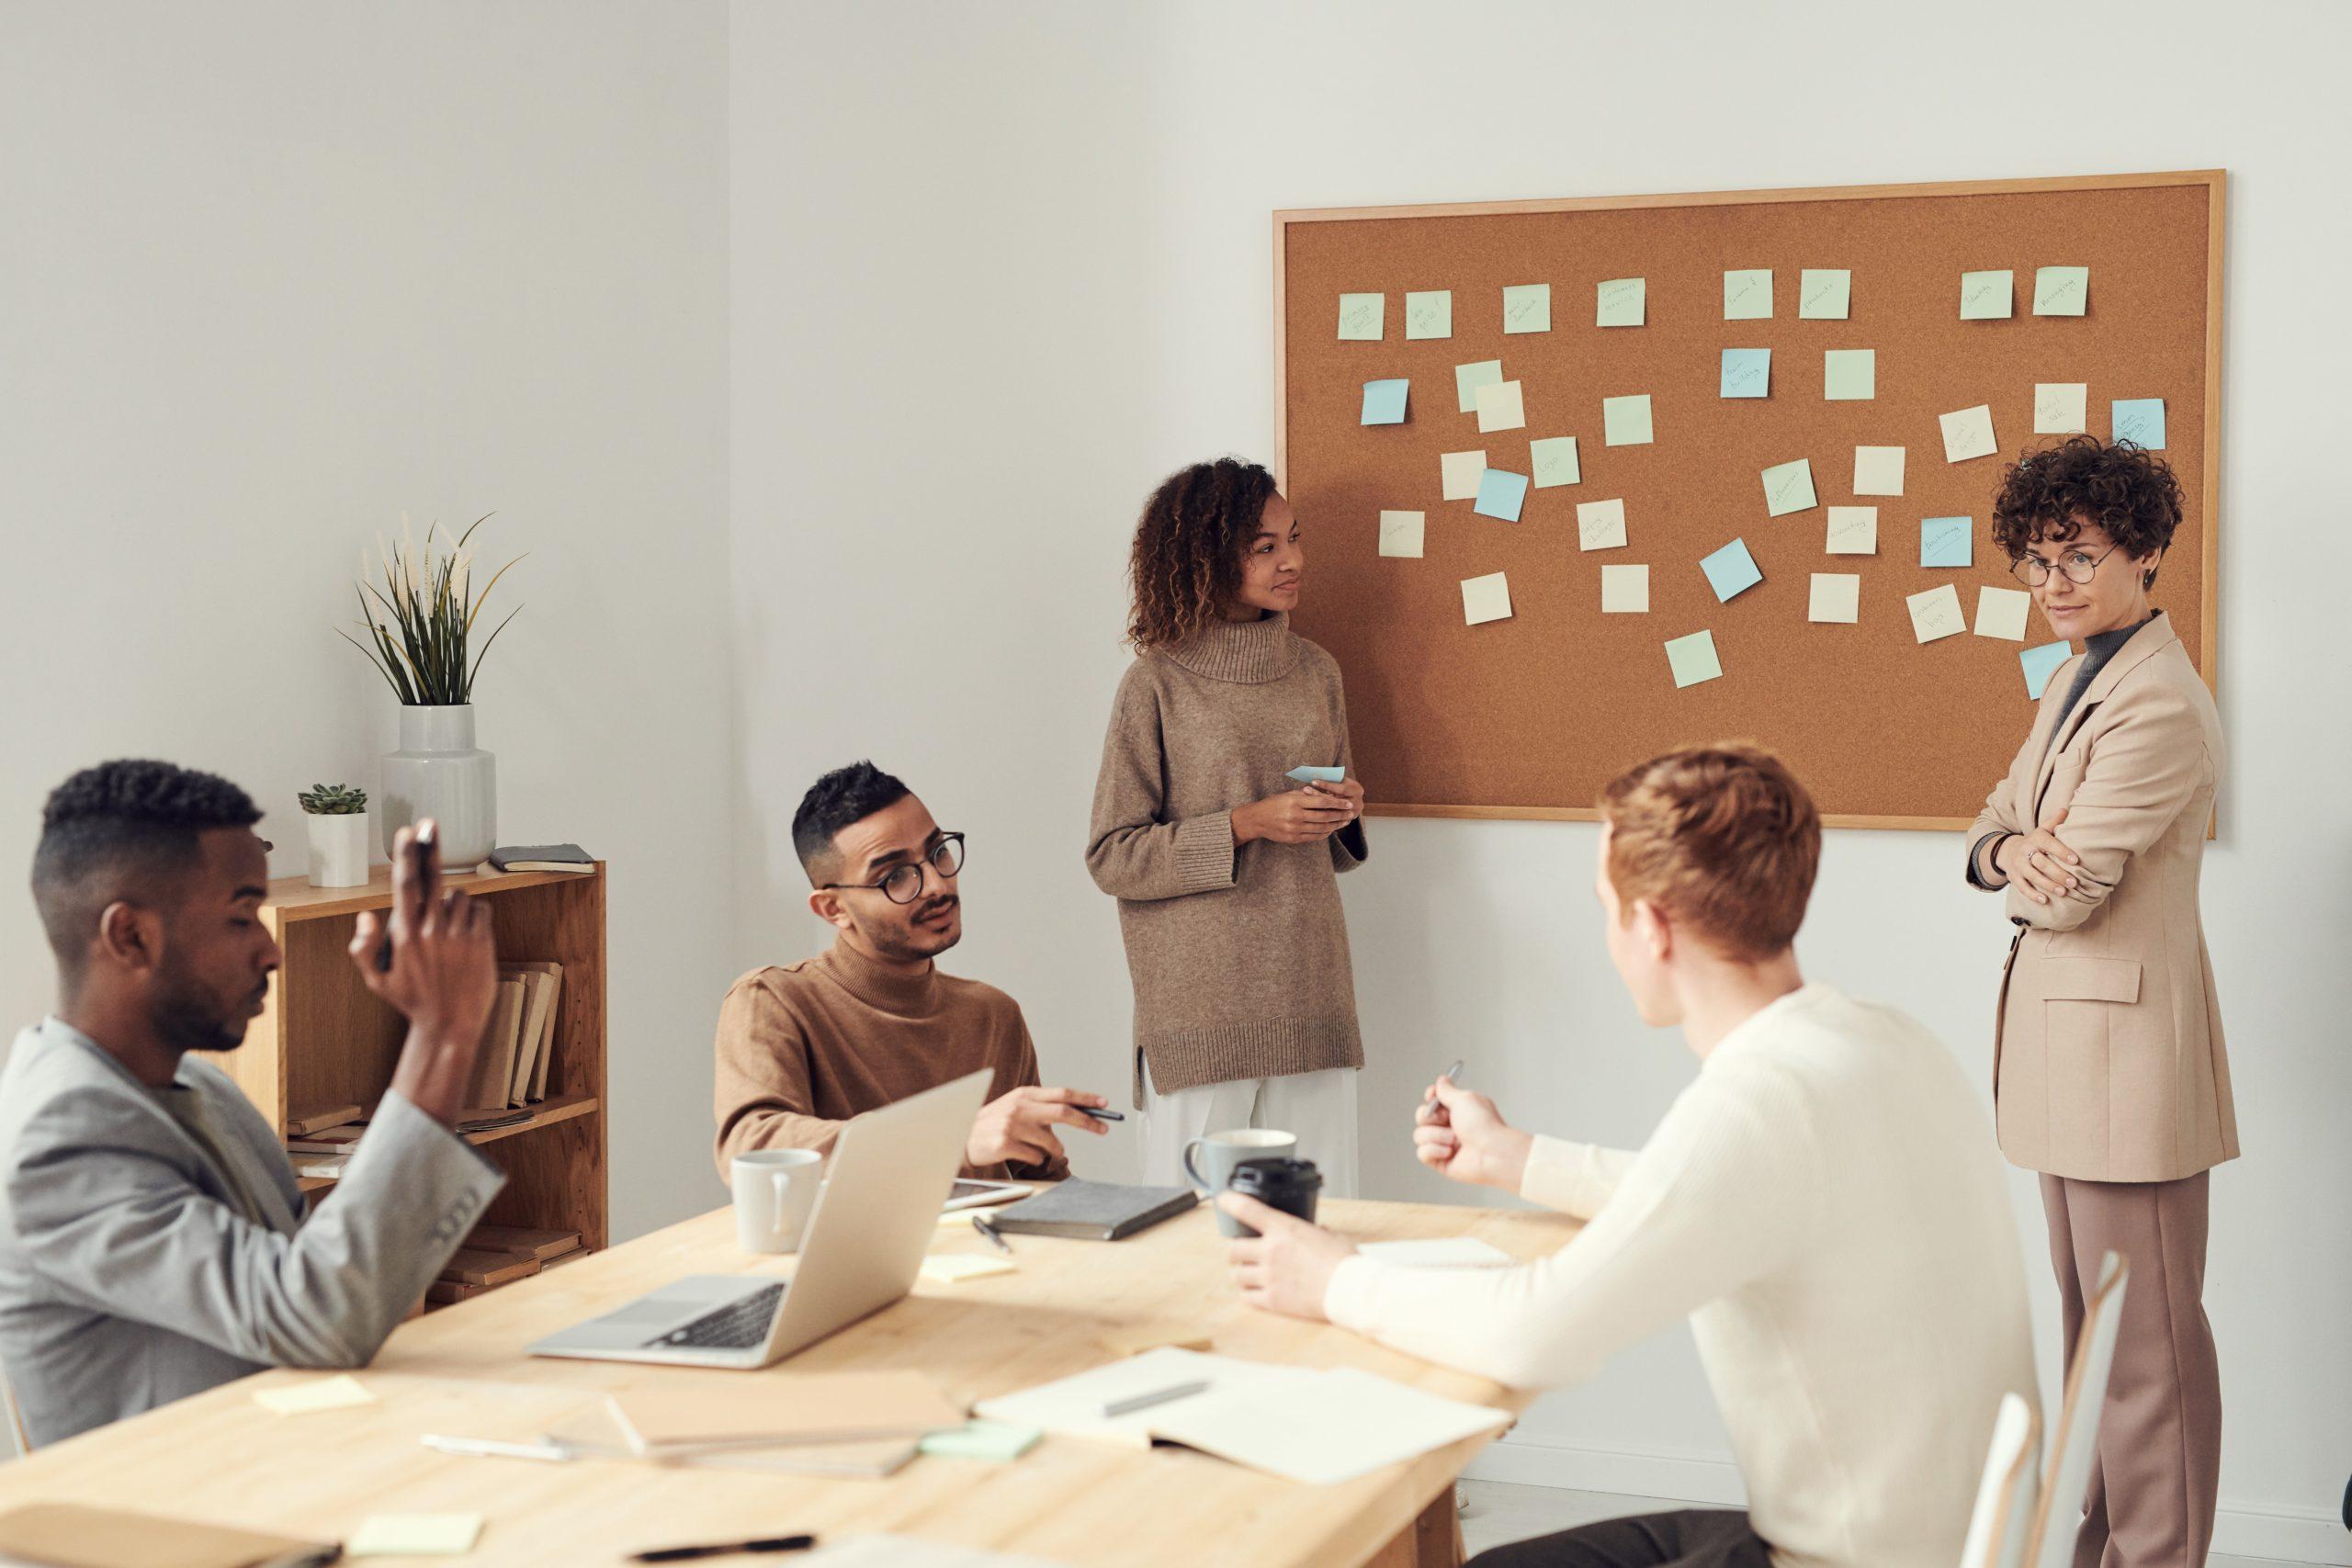 viro in strategic management image